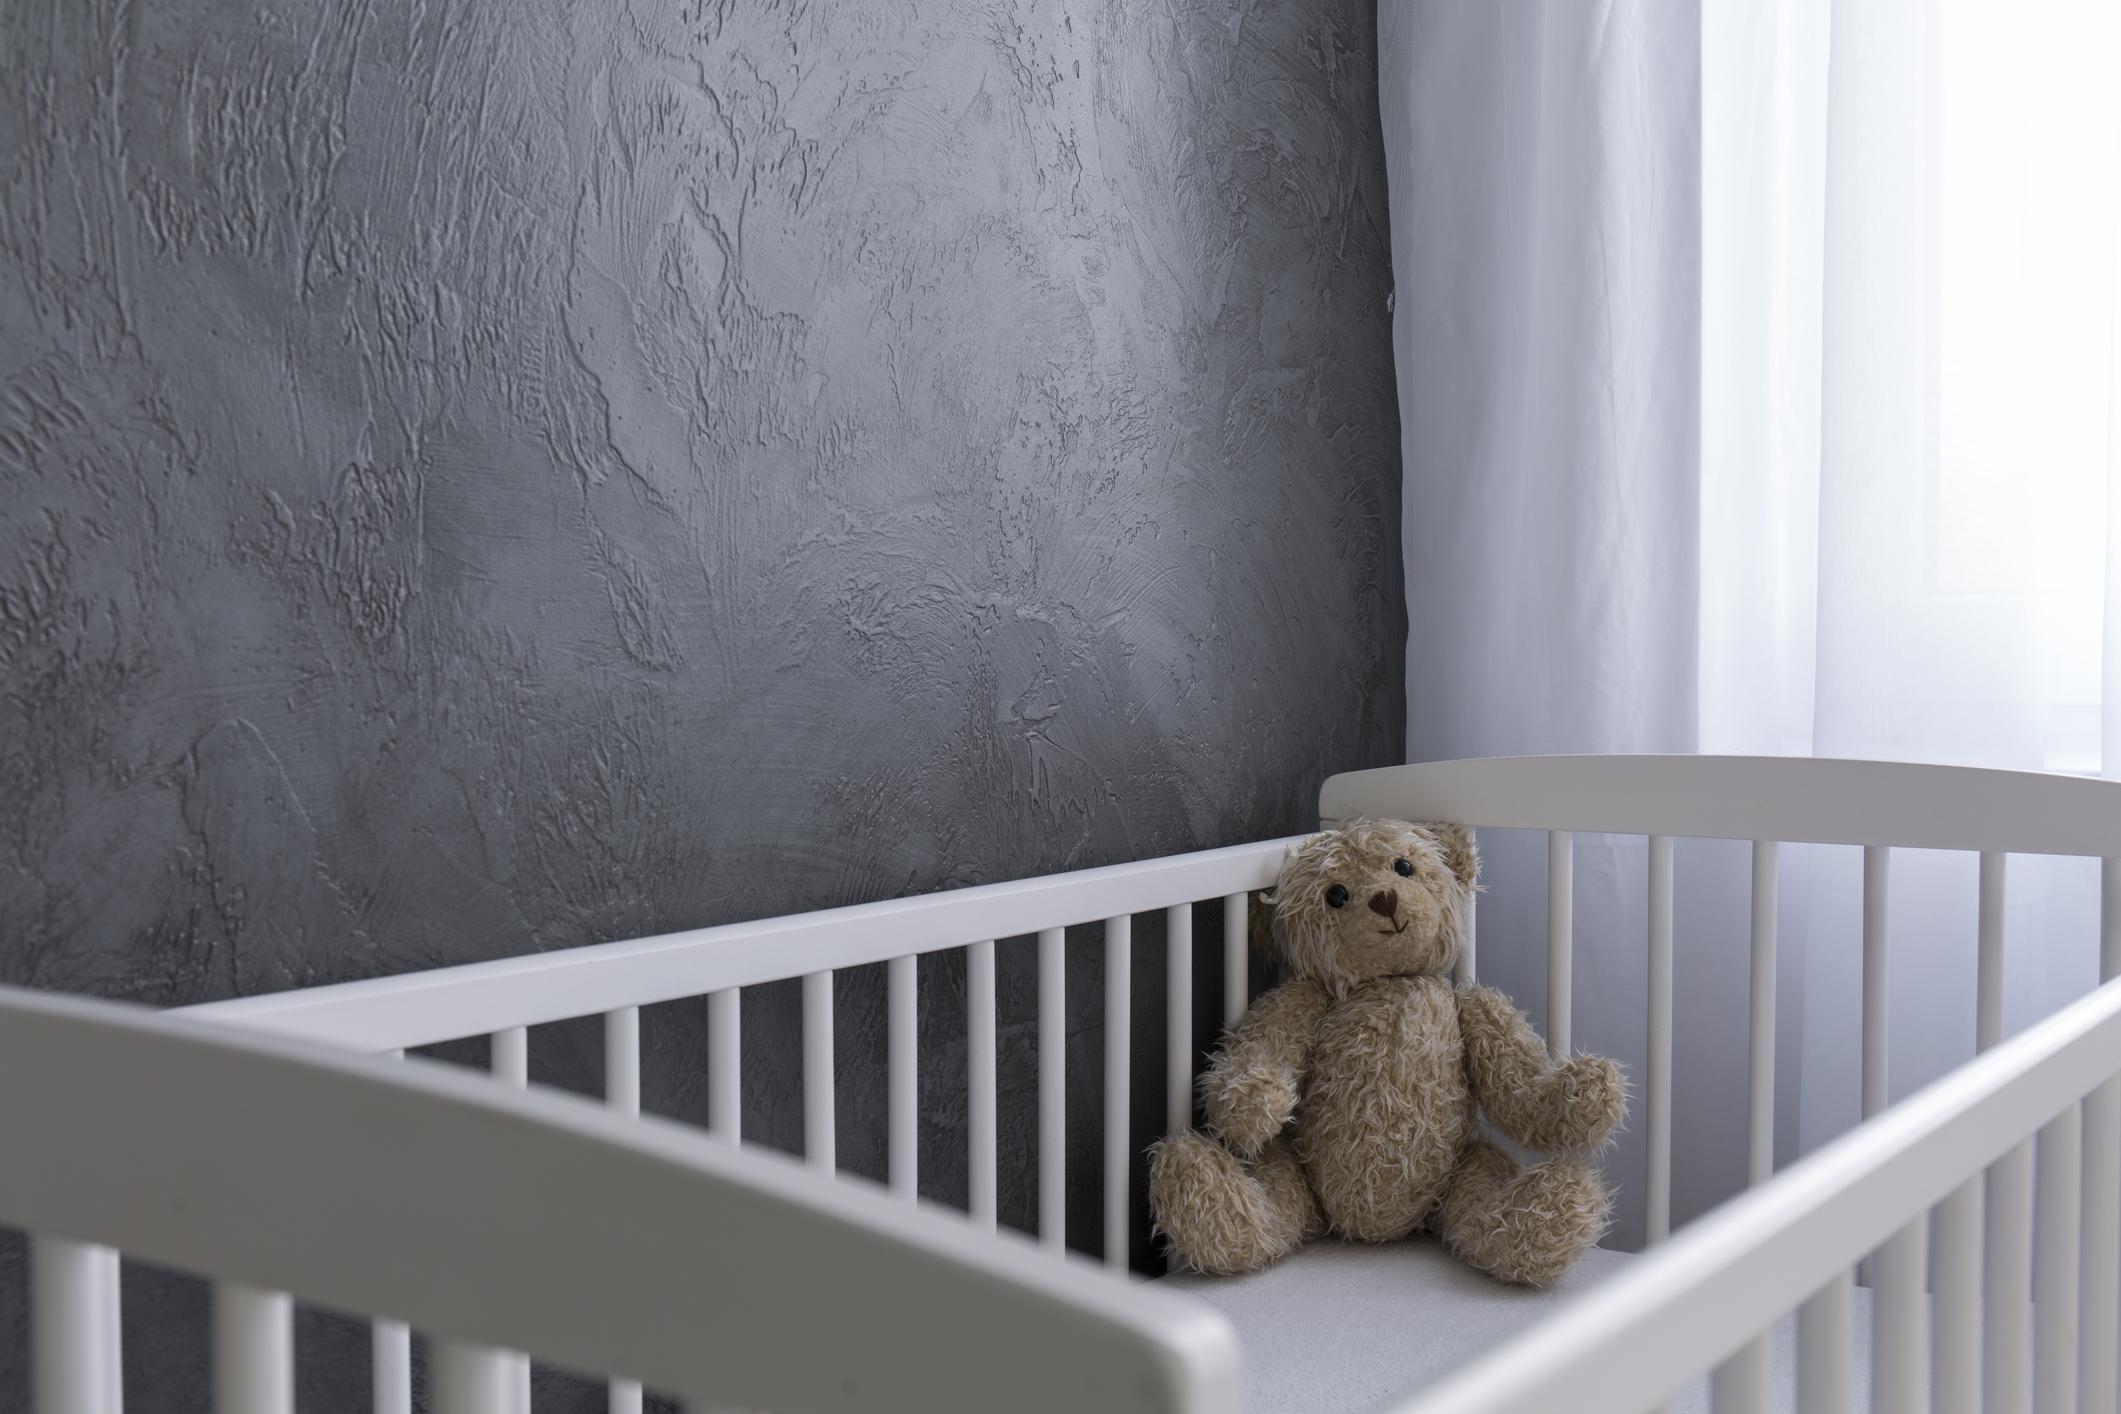 An empty crib with a stuffed animal bear lying in the corner.